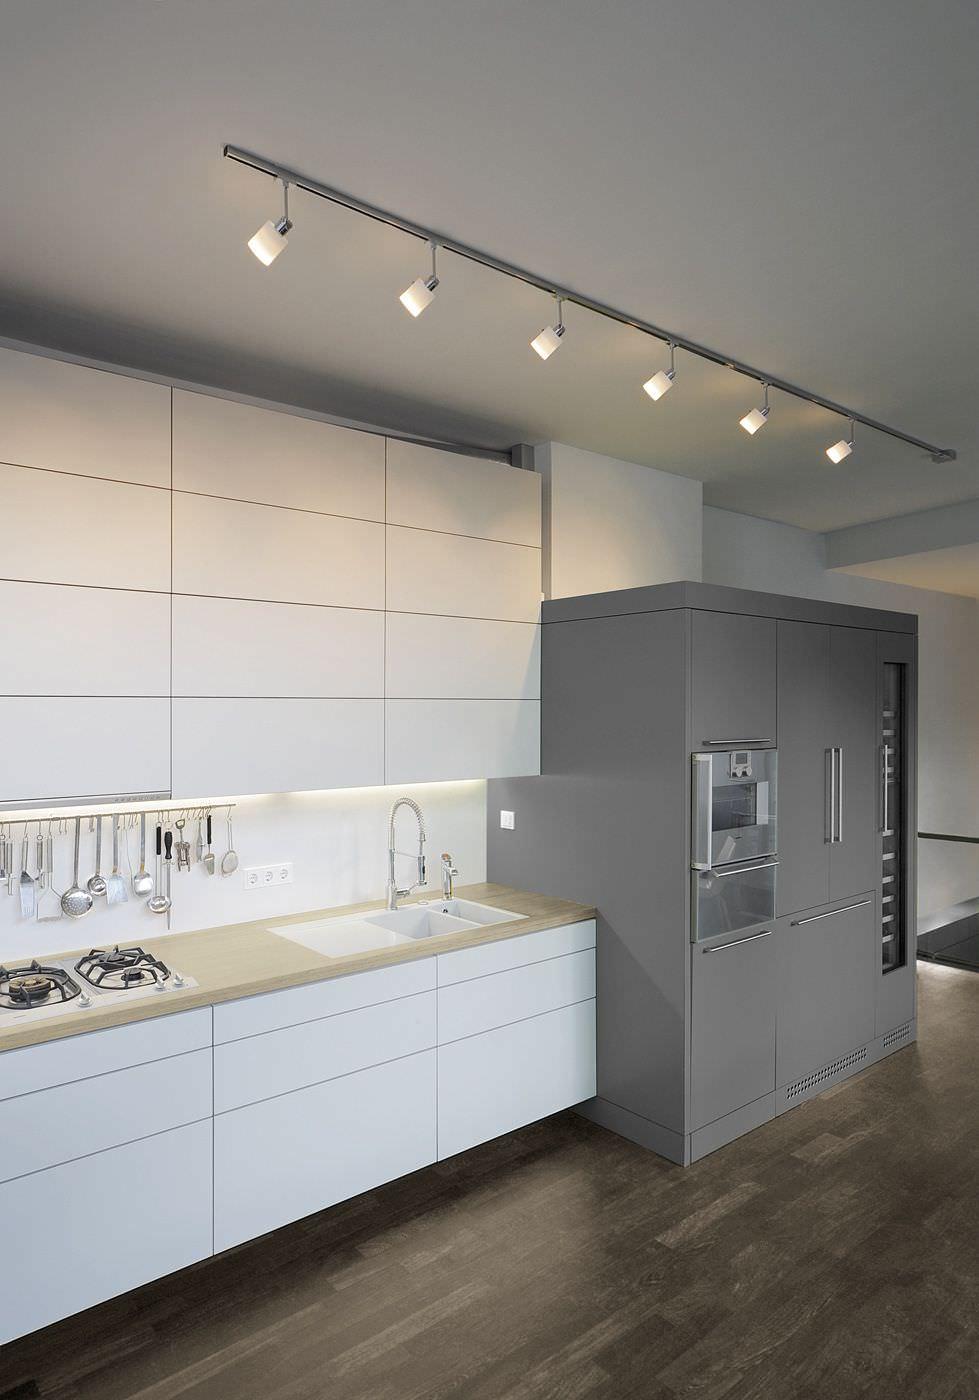 railsystemen bogaard lichtdesign elektra. Black Bedroom Furniture Sets. Home Design Ideas